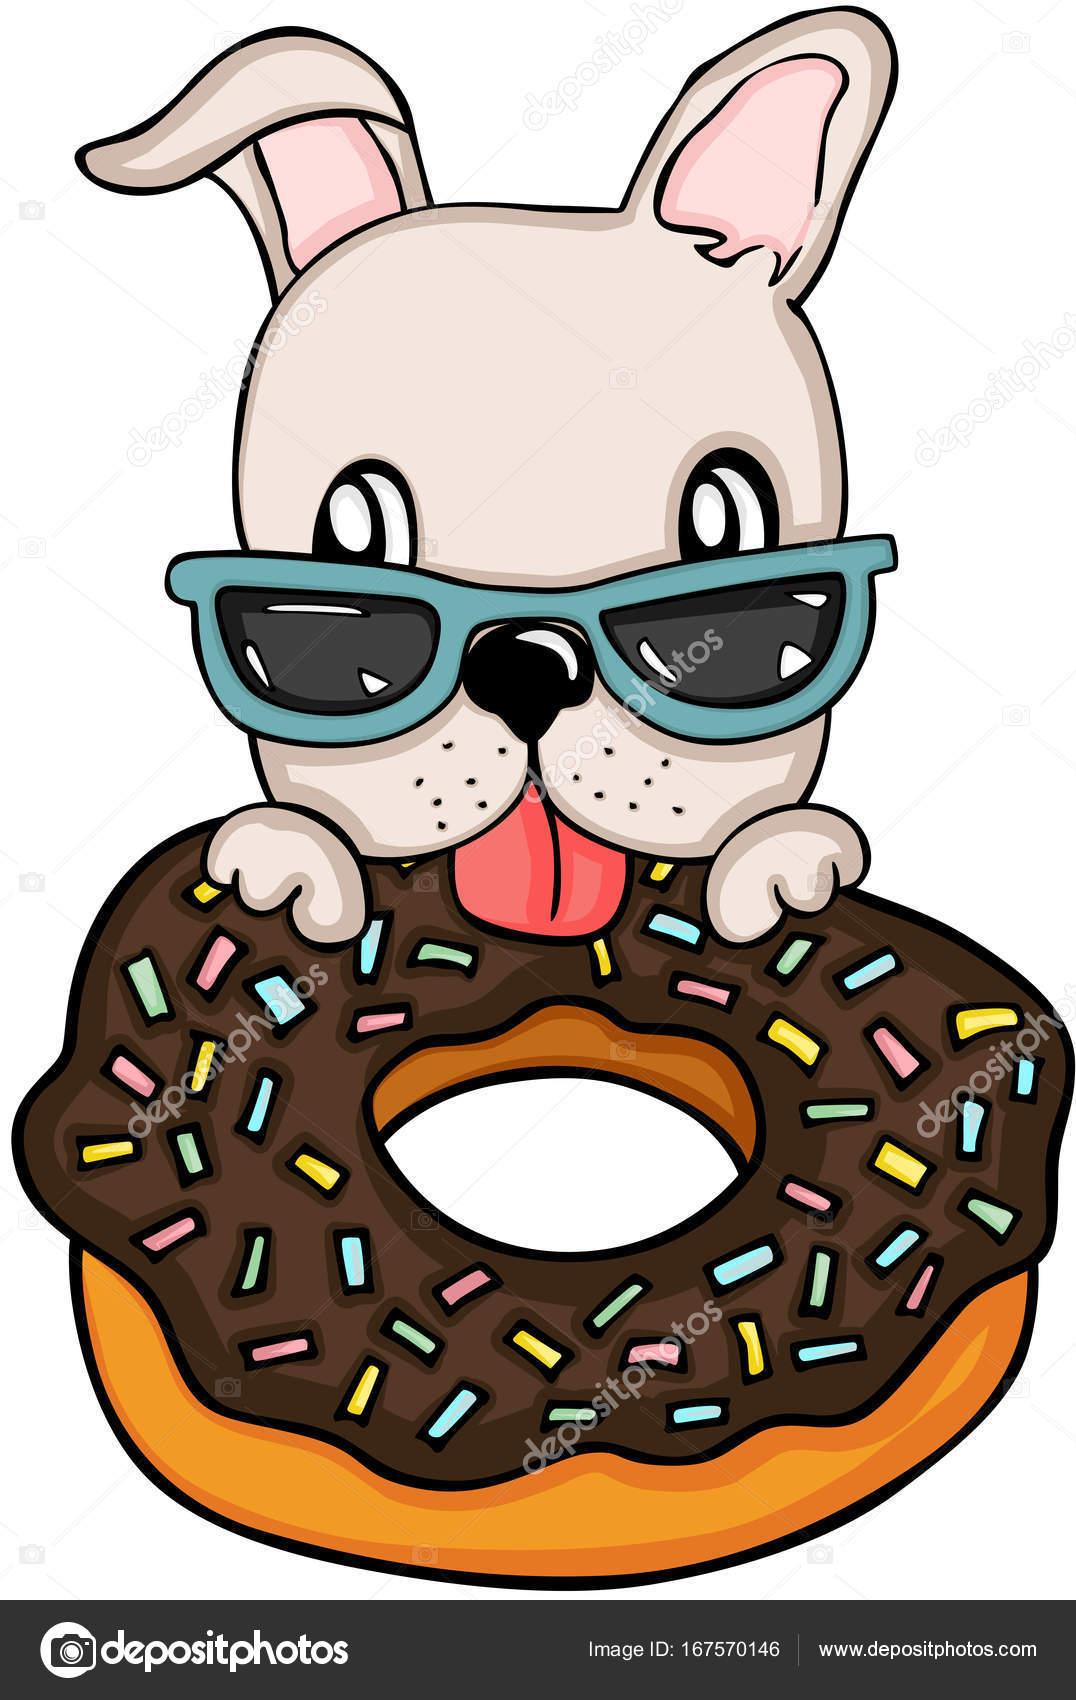 Dog eating chocolate cake donut Stock Vector socris79 167570146